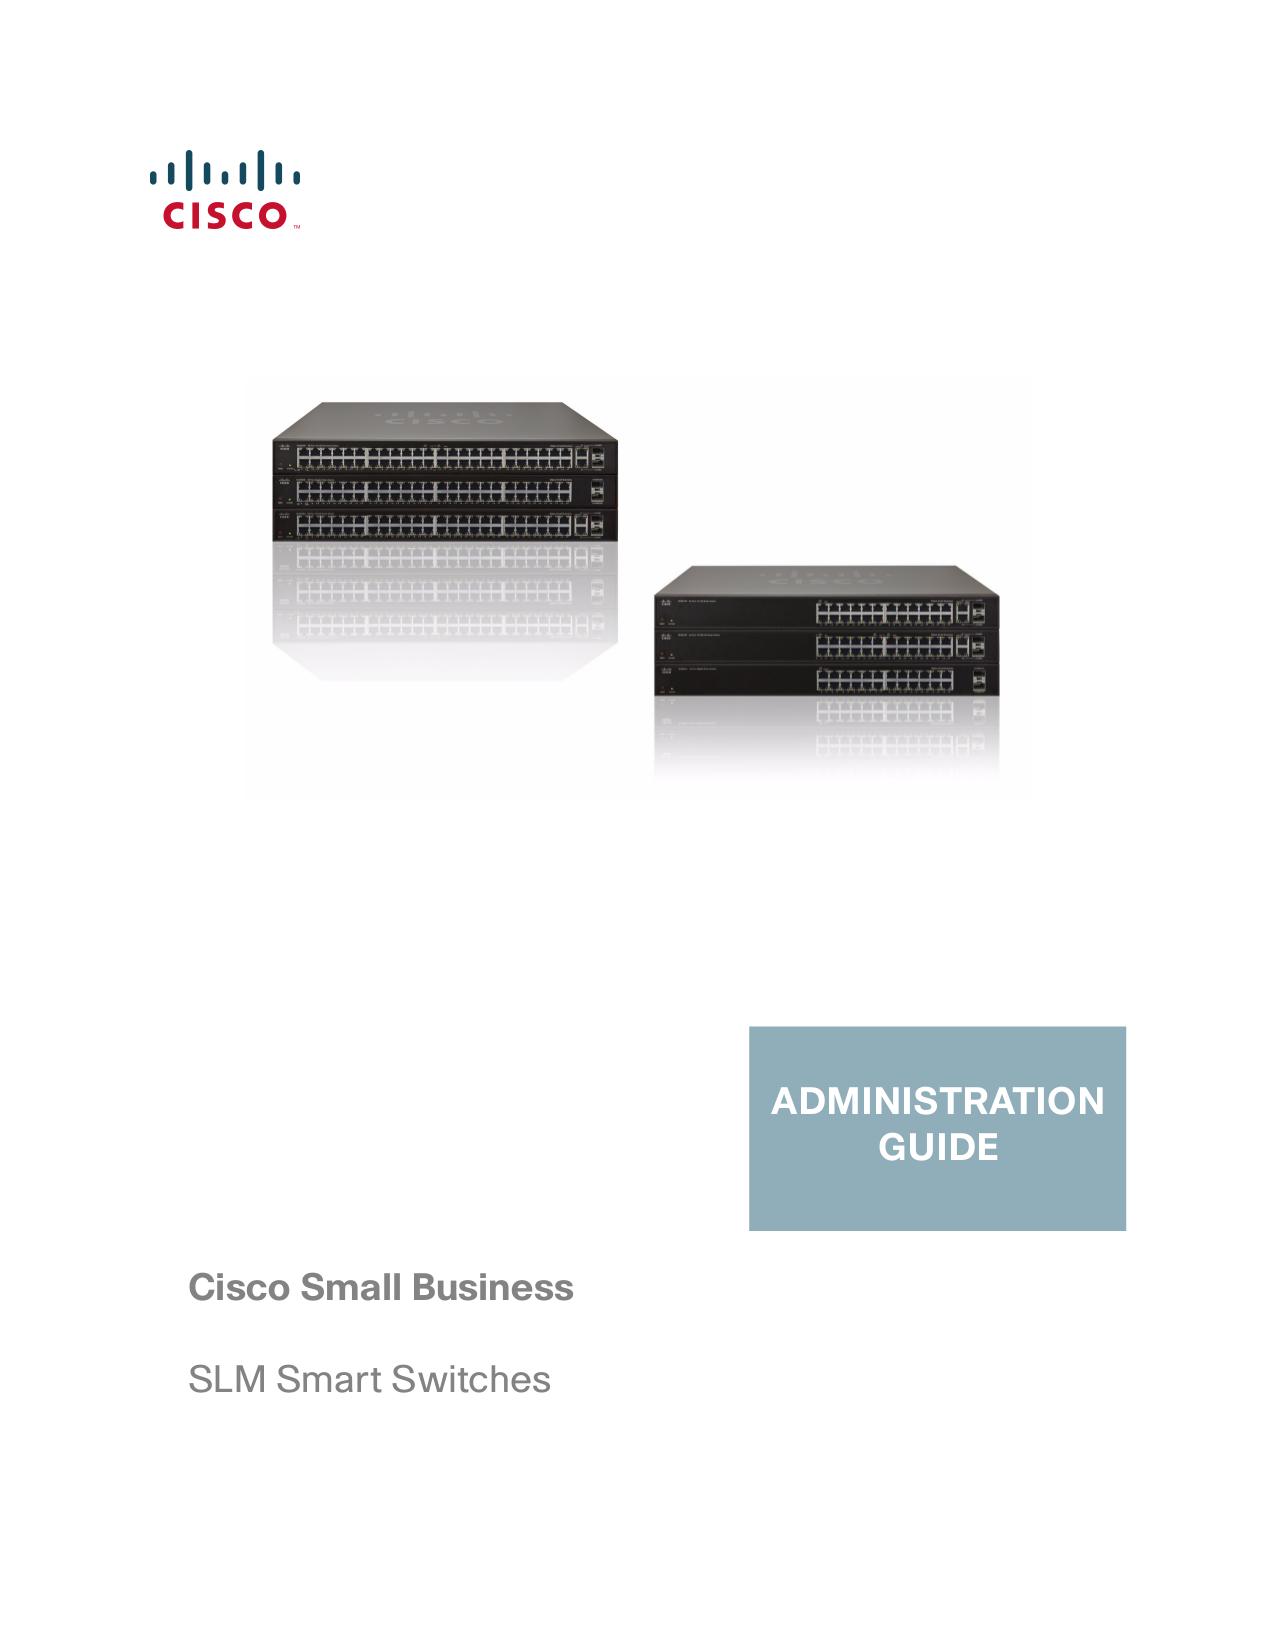 pdf for Linksys Switch SLM224G manual